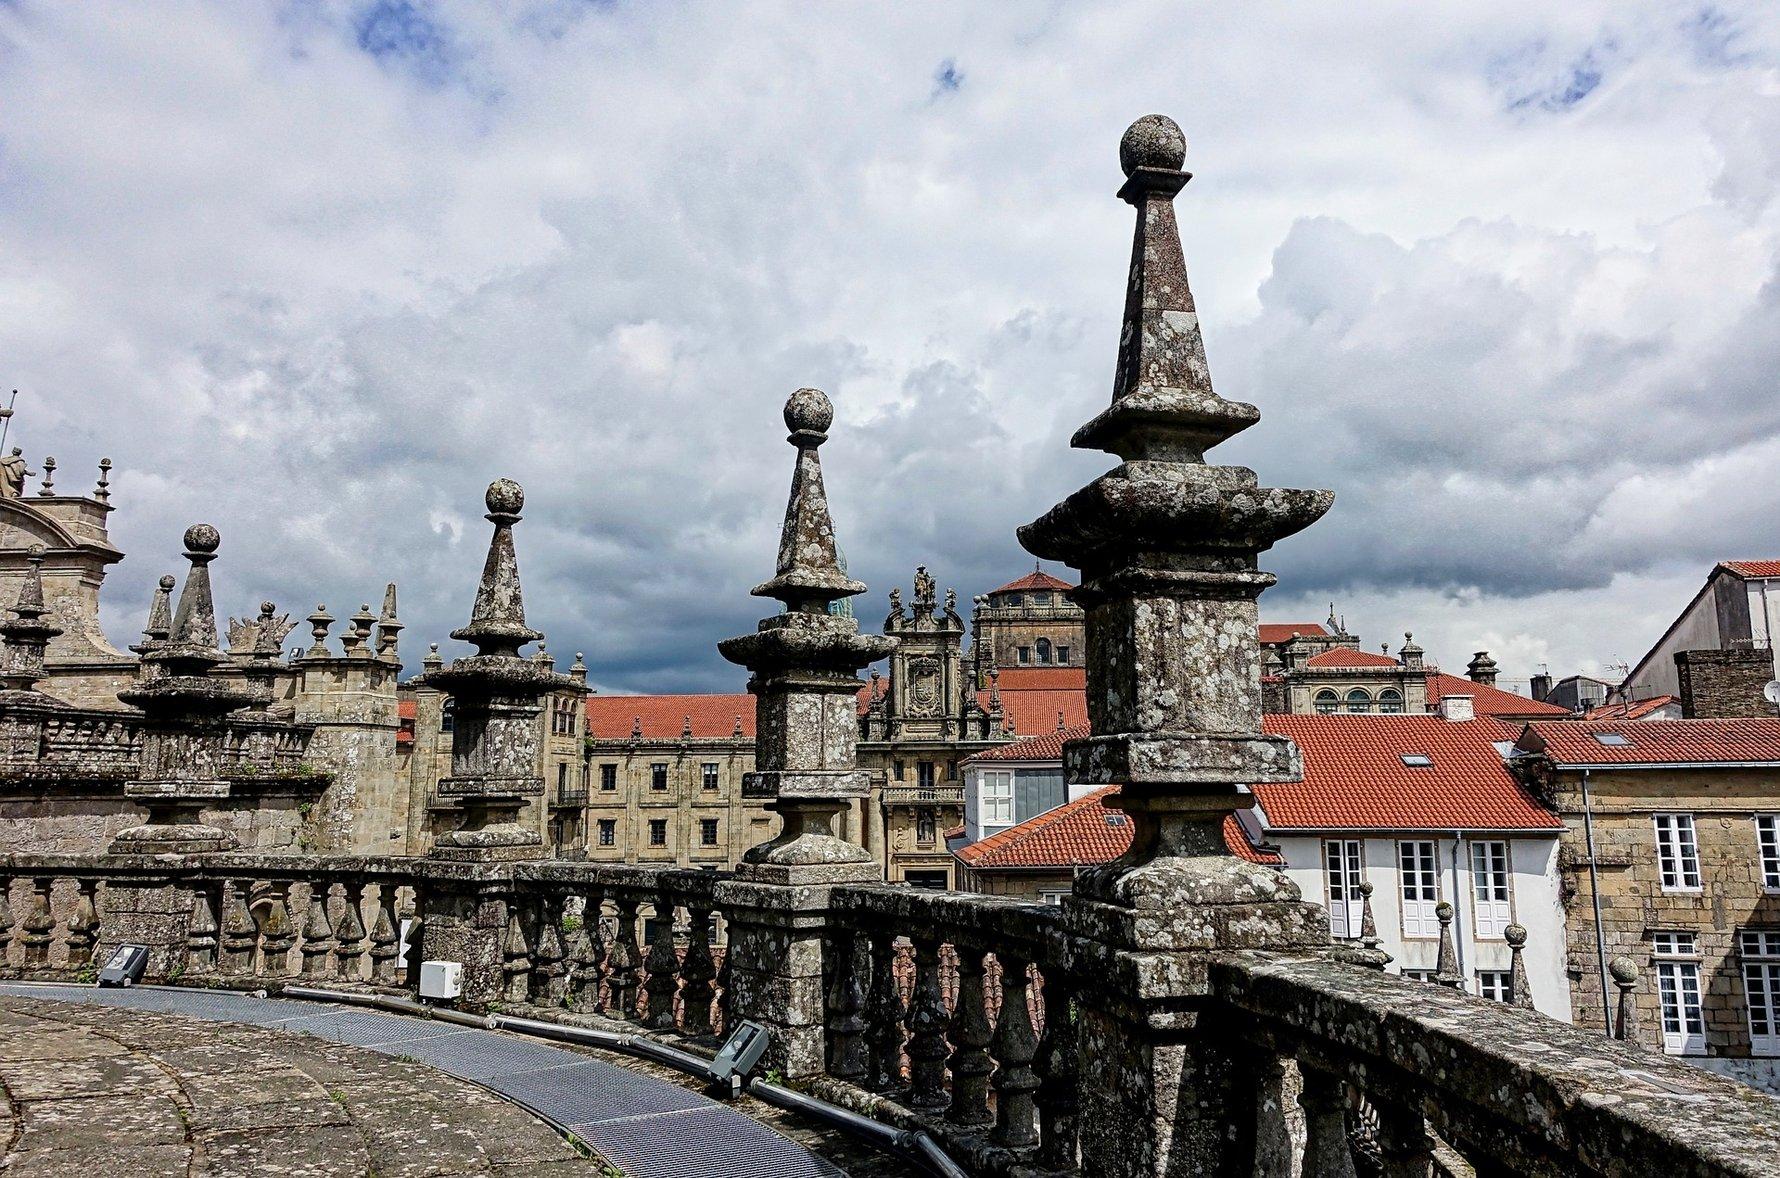 Santiago de Compostela © Siggy Nowak from Pixabay